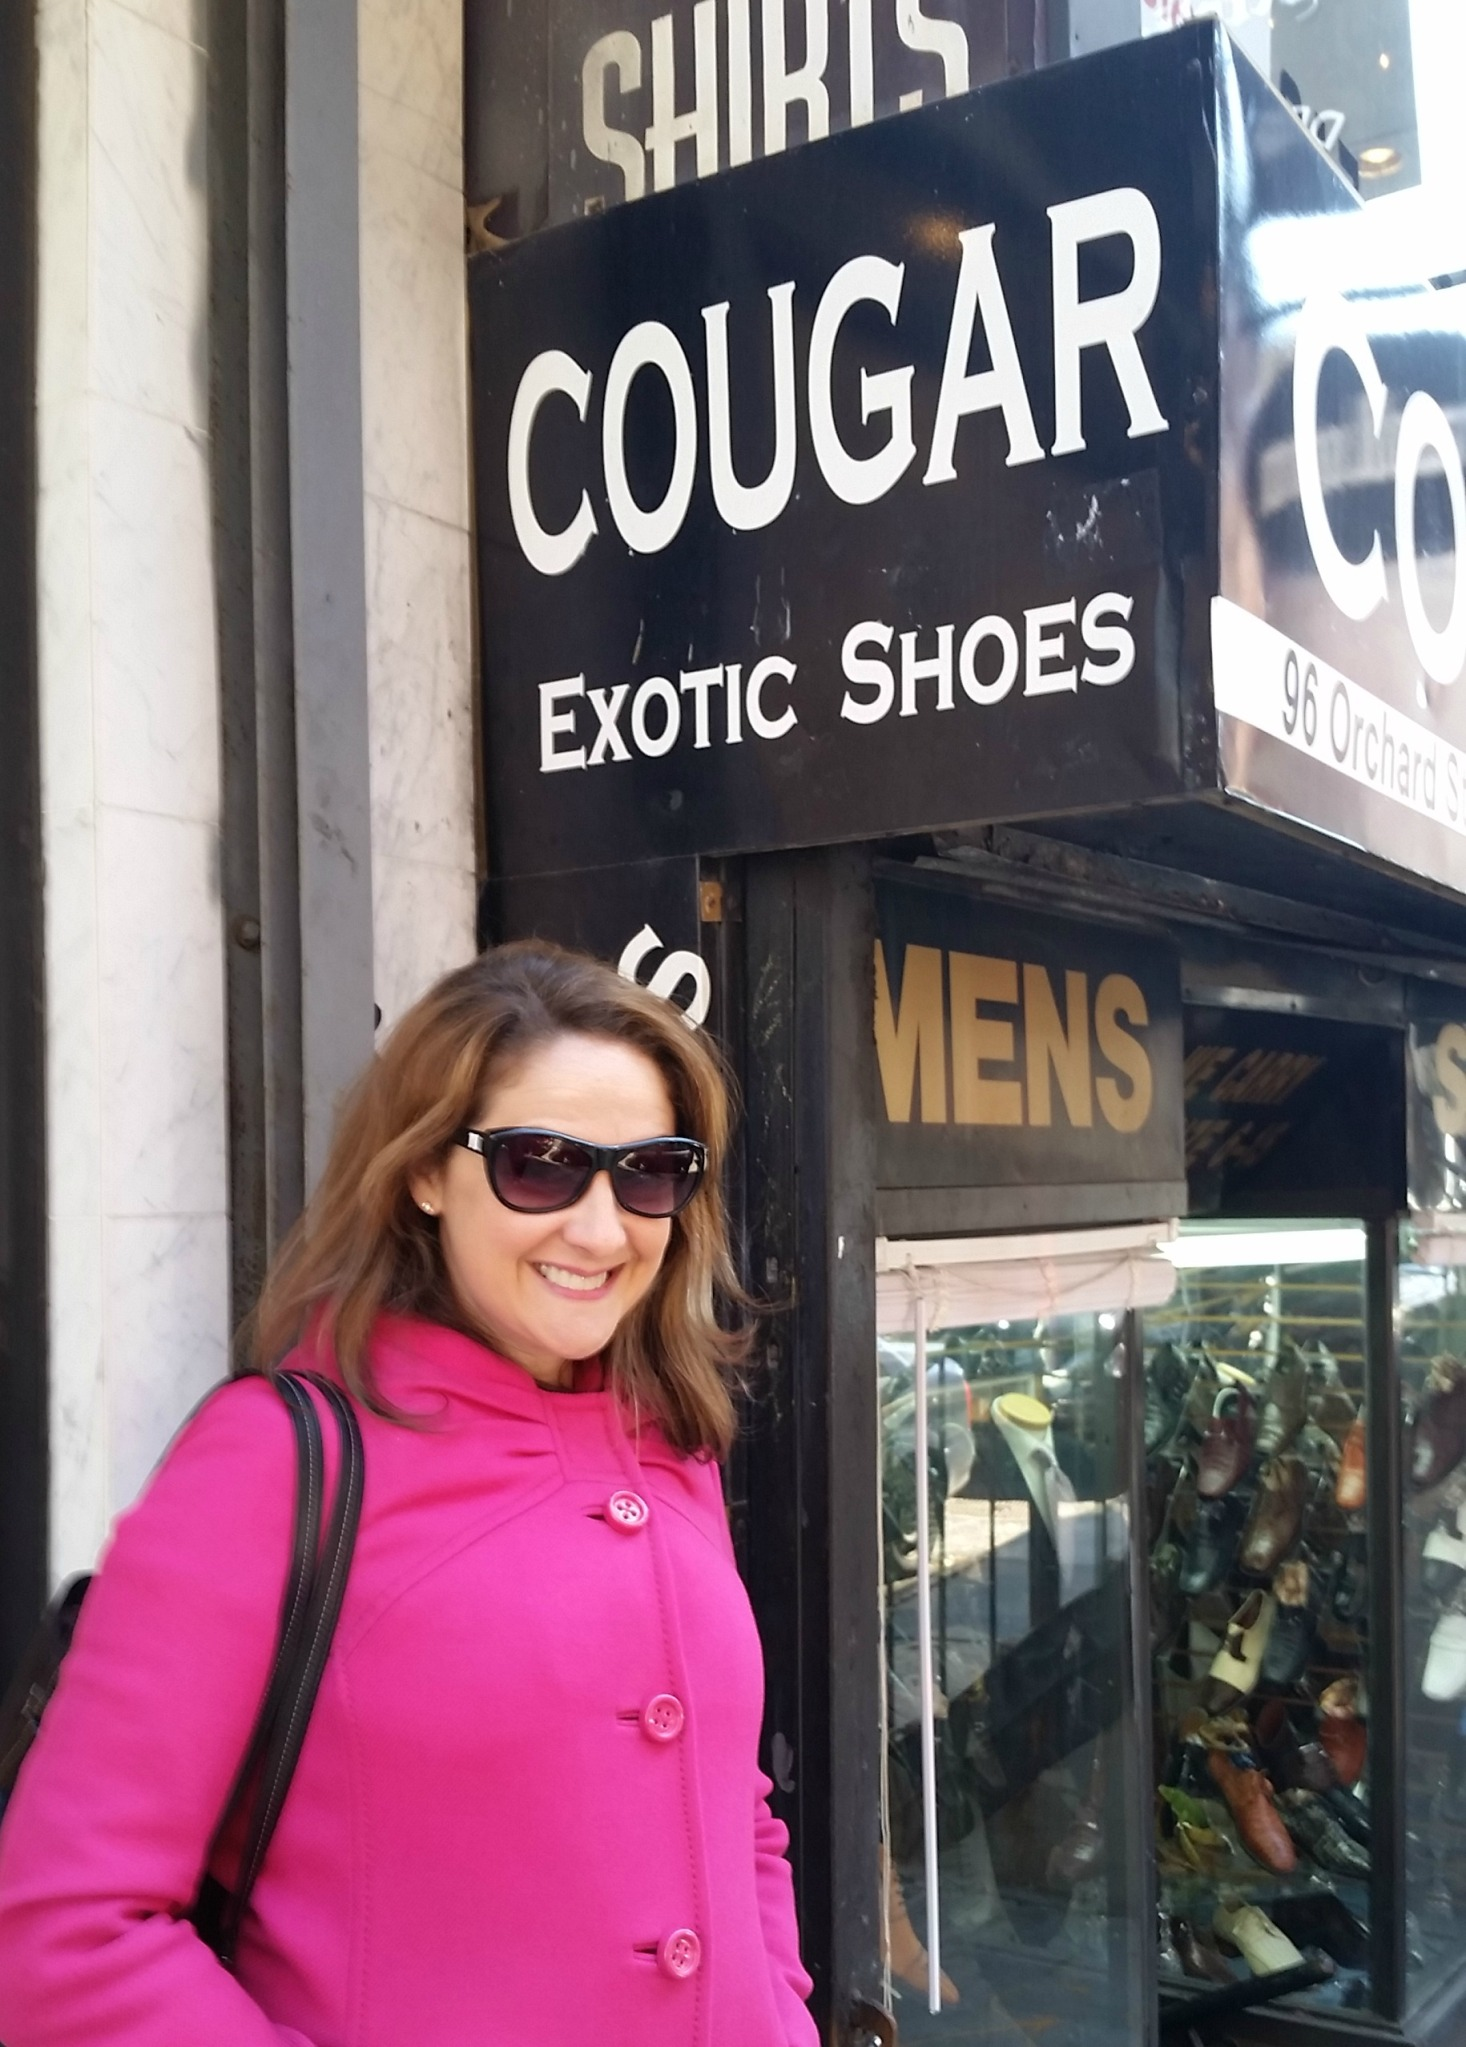 Cougar 20150329_132547